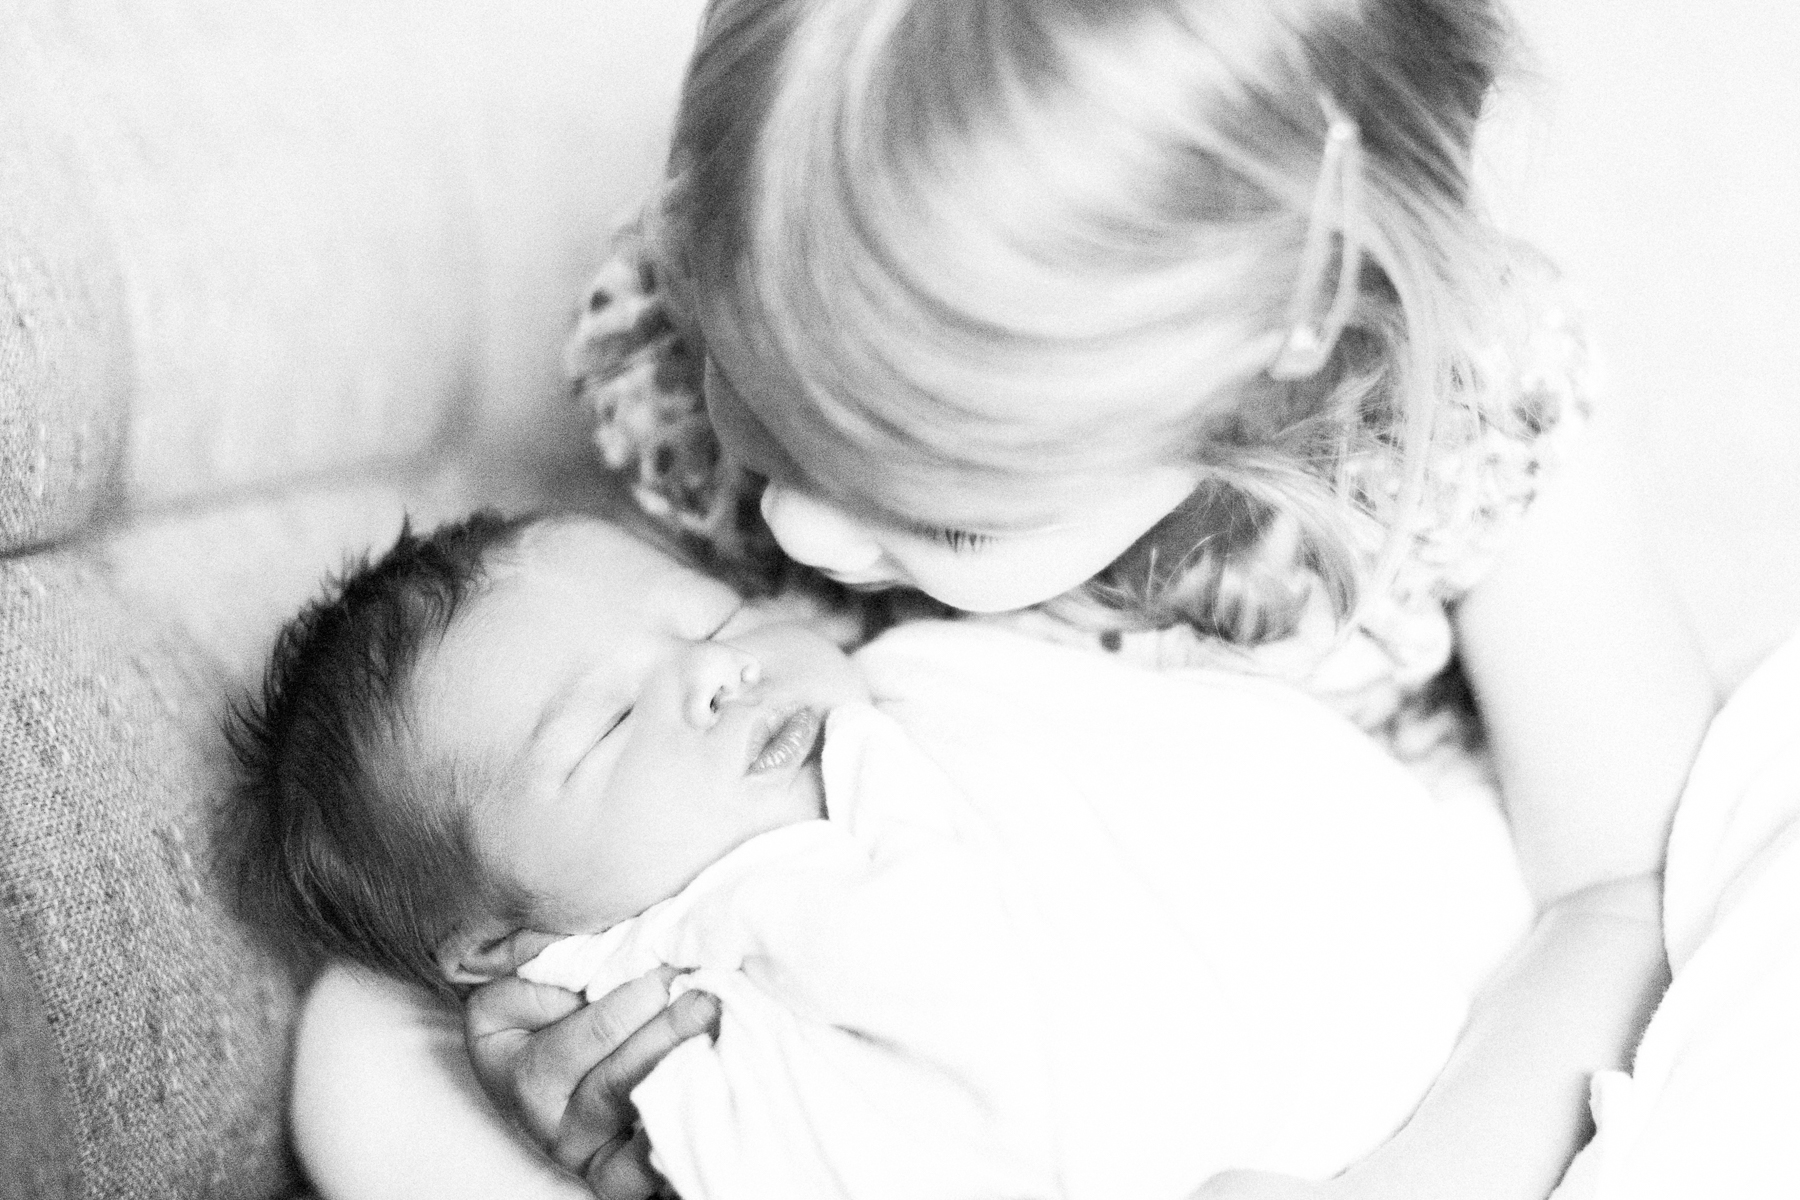 san-diego-newborn-photographer-2180.jpg